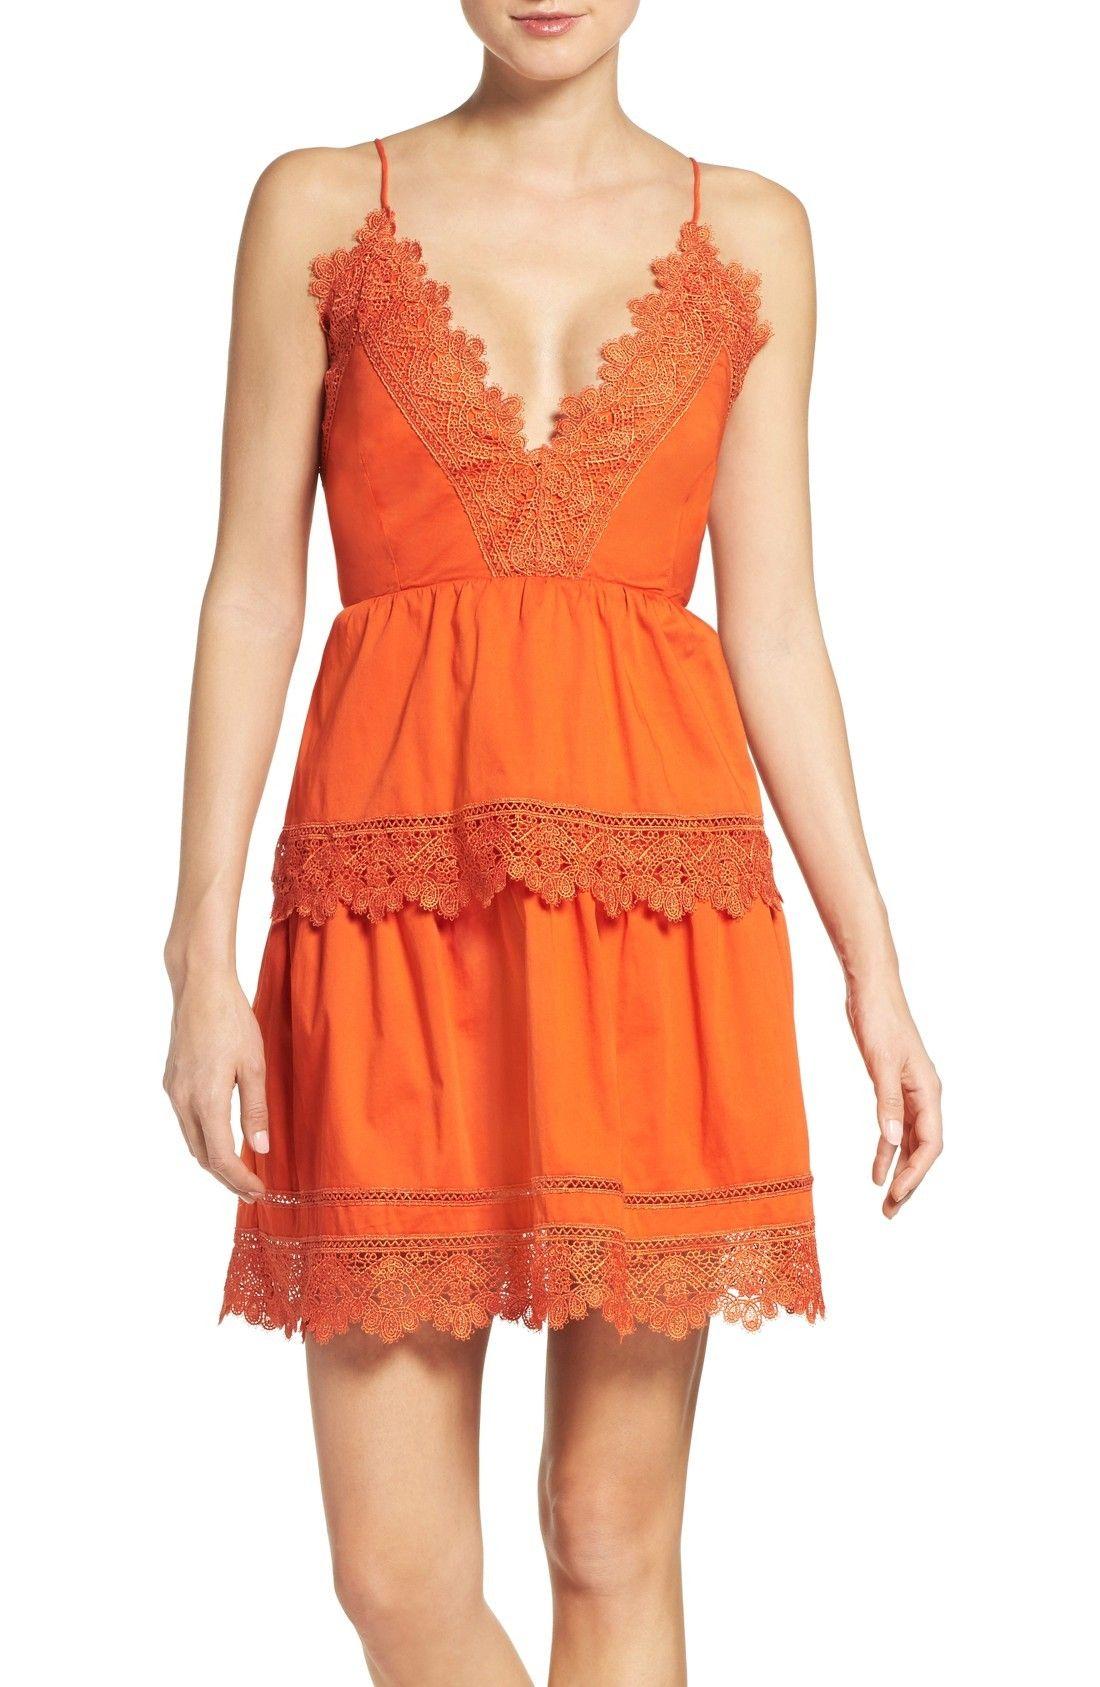 Shop tangerine bridesmaid dress on wanelo cocktail dresses shop tangerine bridesmaid dress on wanelo ombrellifo Image collections